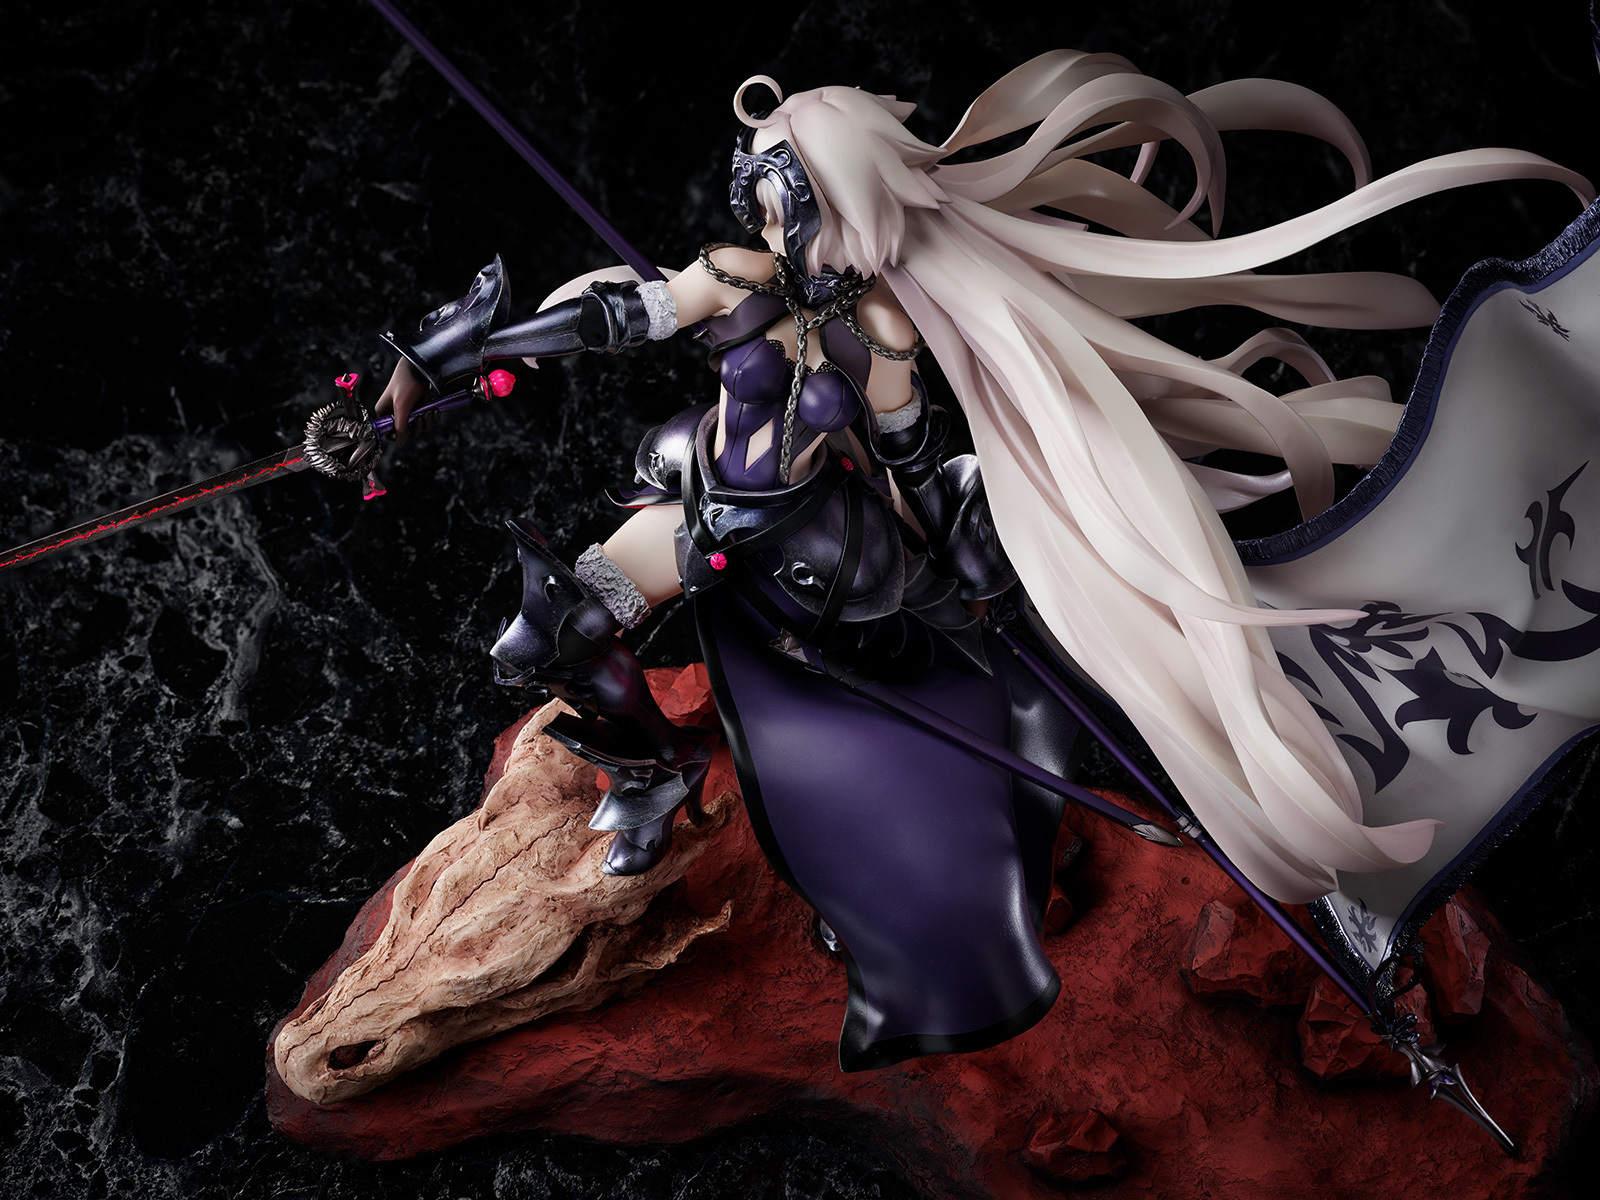 【情報】Licorne《Fate/Grand Order》Avenger/貞德[Alter] 2021年1月發售 - Liu1029的創作 - 巴哈姆特